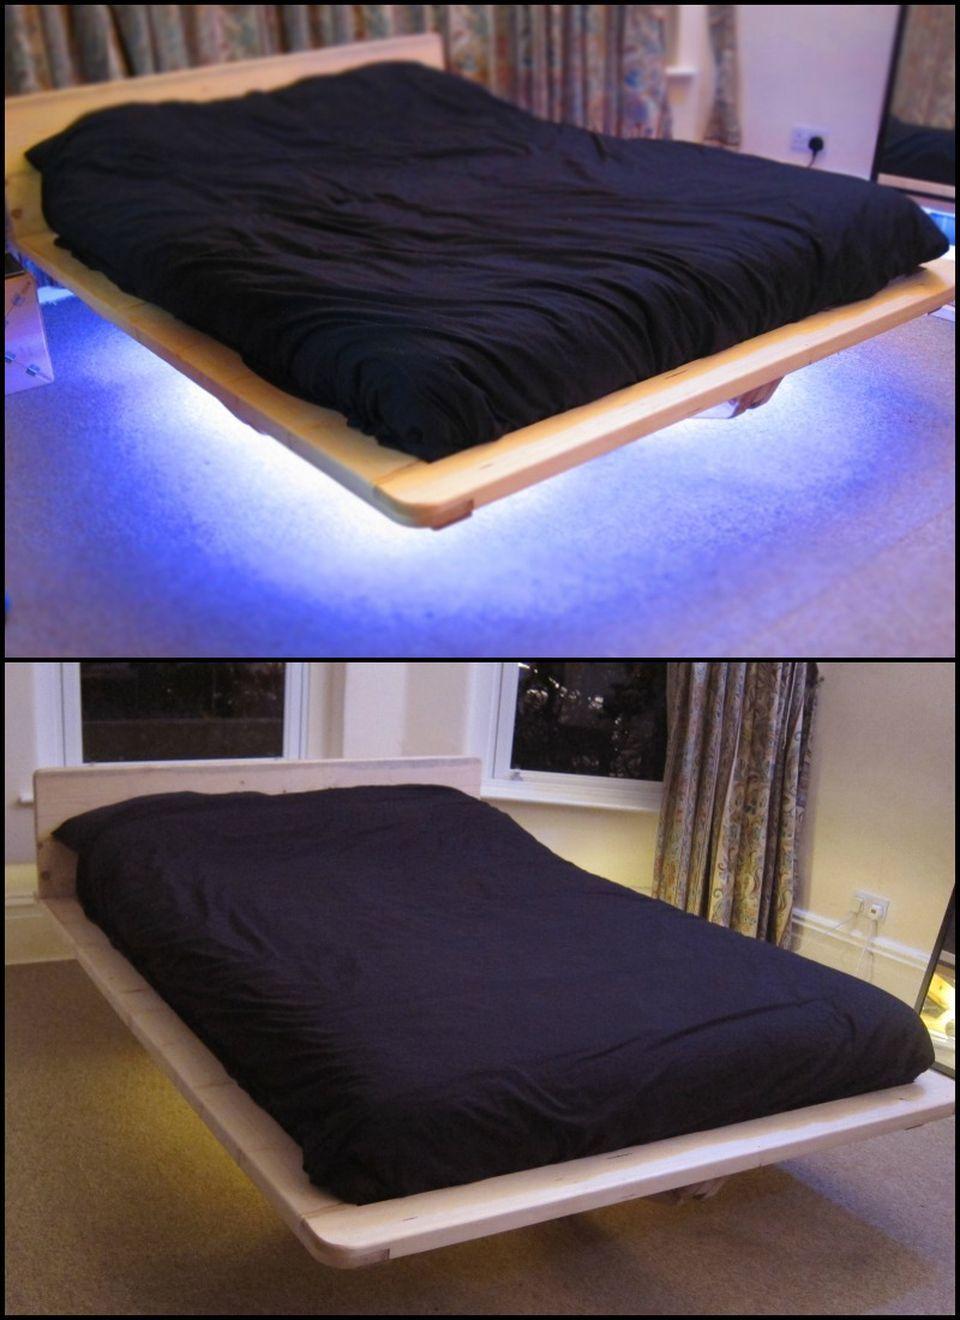 Amazing Modern Floating Bed Design With Under Light Hoommy Com Floating Bed Bed Design Floating Bed Frame